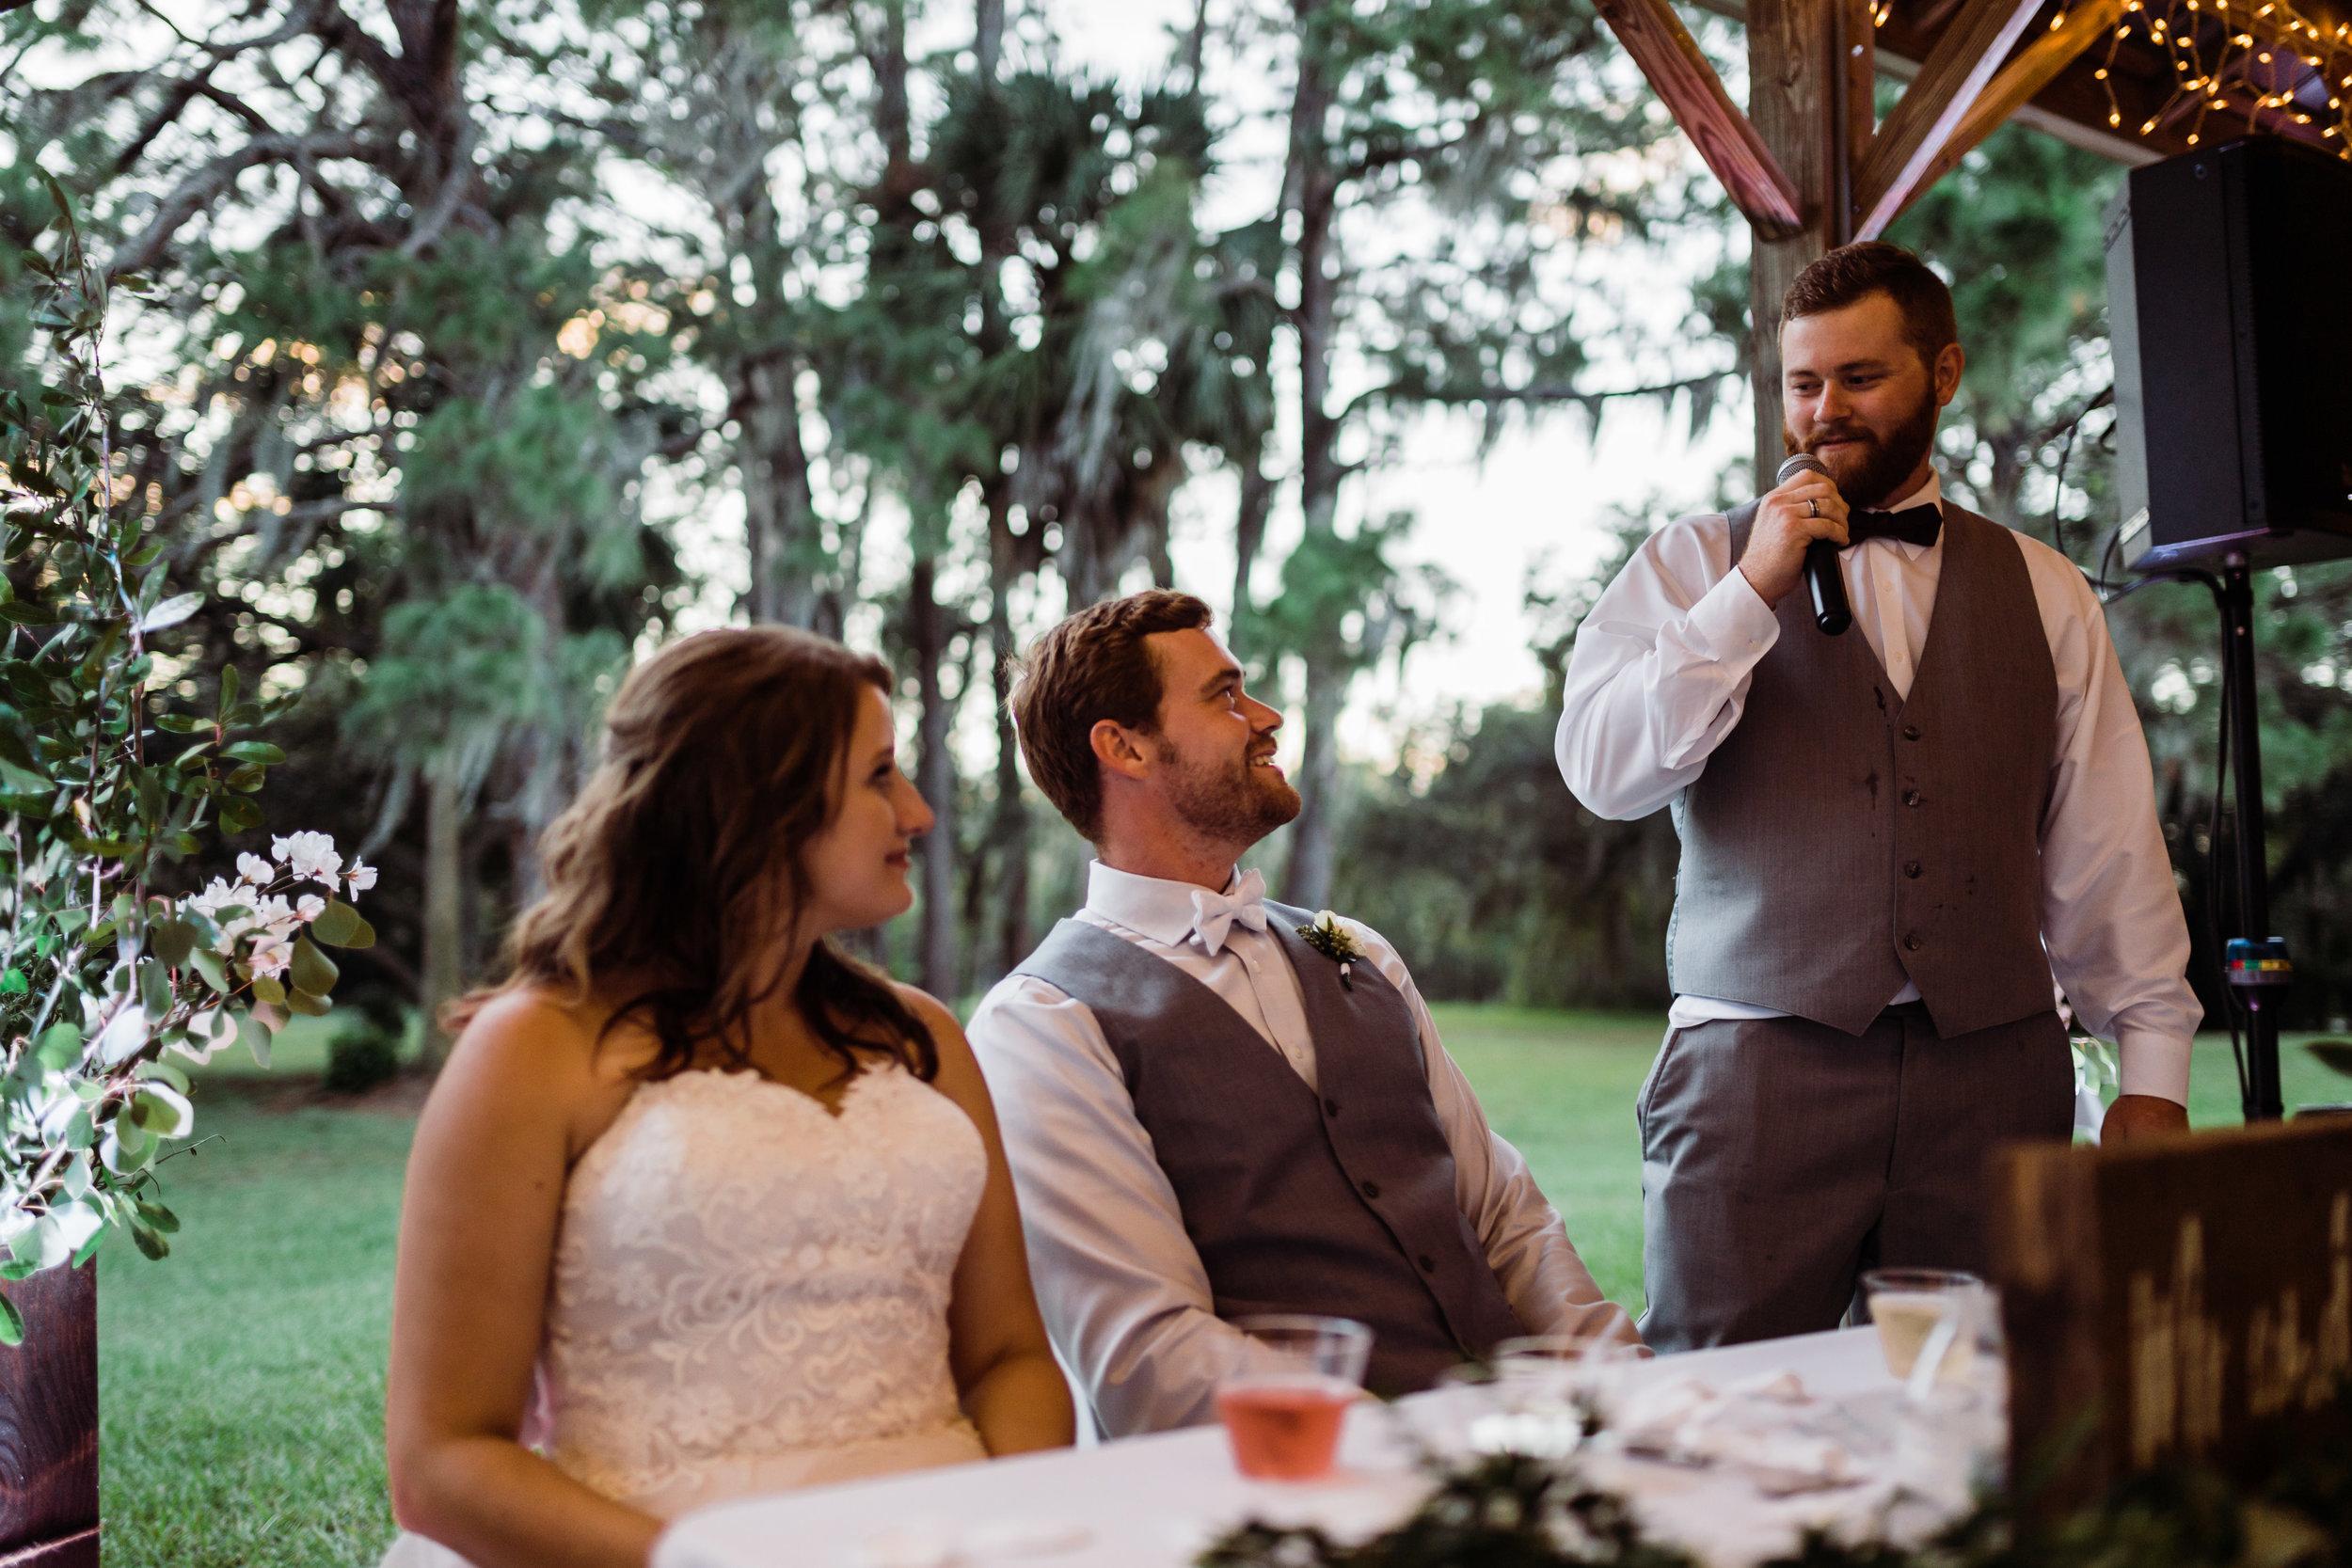 2017.10.14 Samantha and Matthew Crabtree Sarasota Wedding (539 of 708).jpg